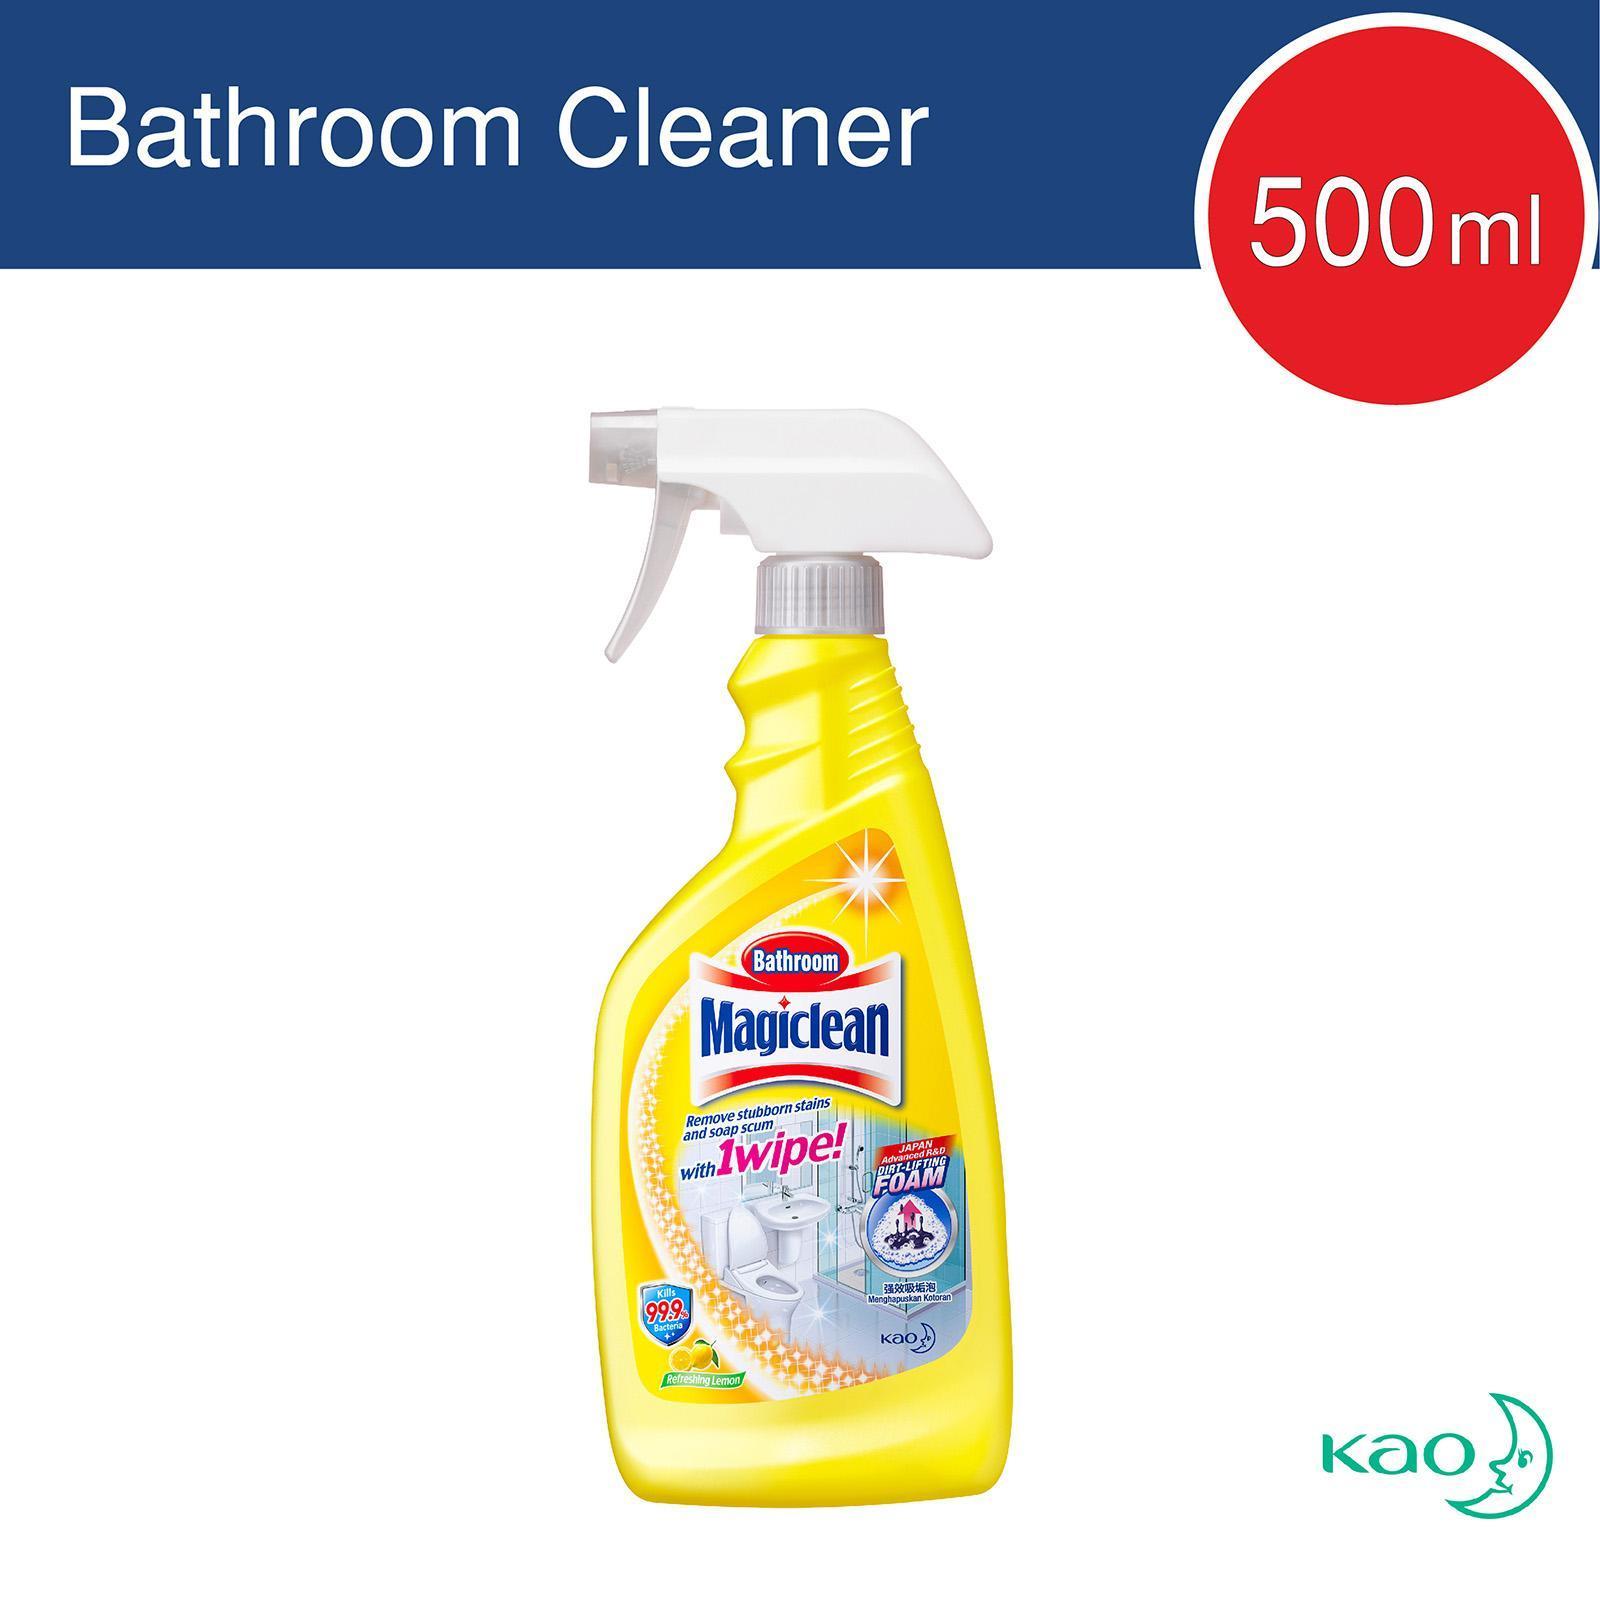 Magiclean Lemon Scent Bathroom Cleaner